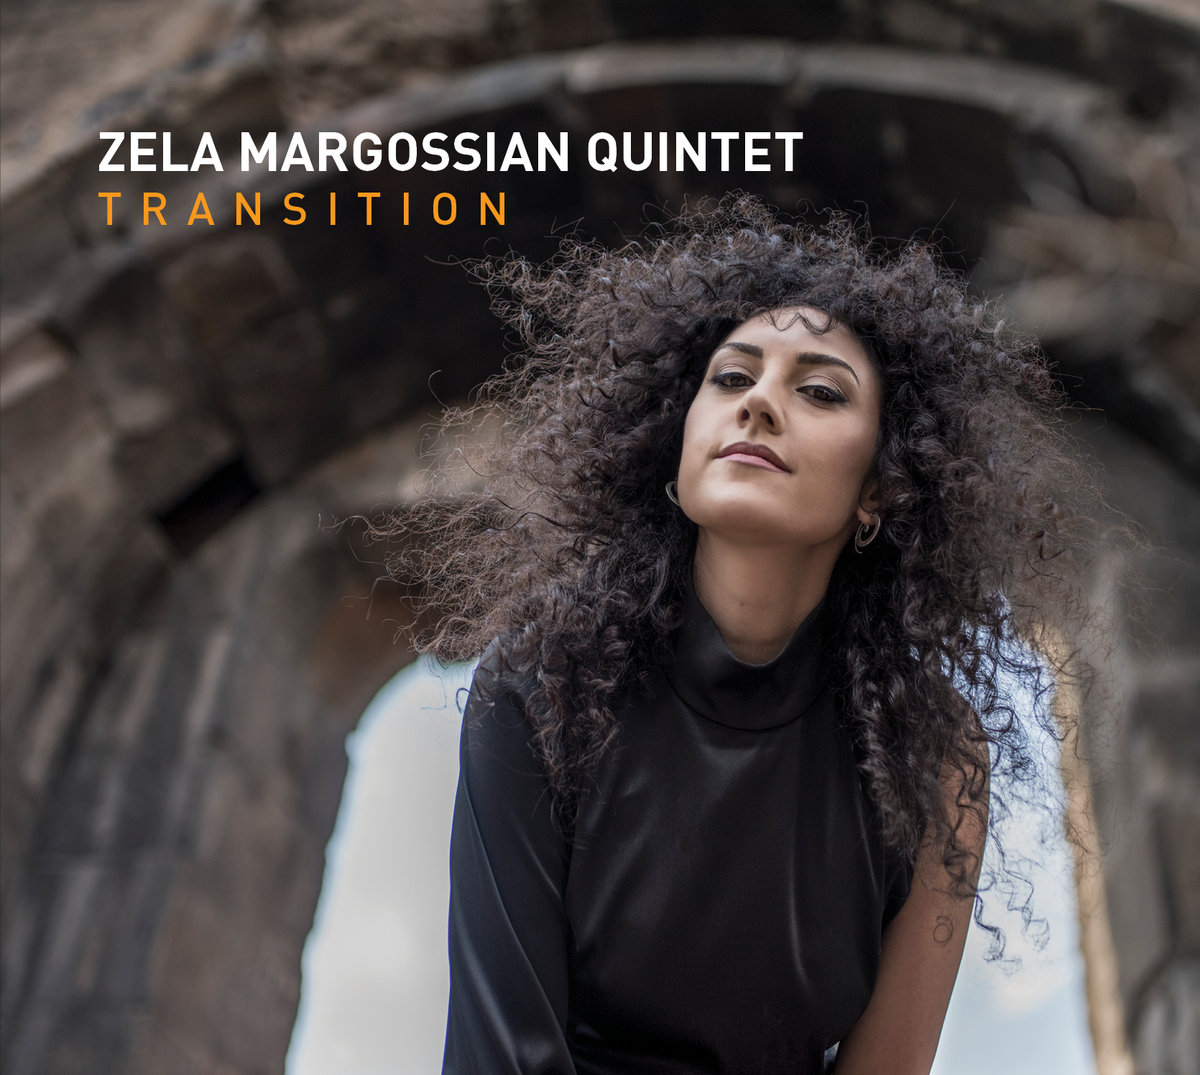 Zela Margossian Quintet